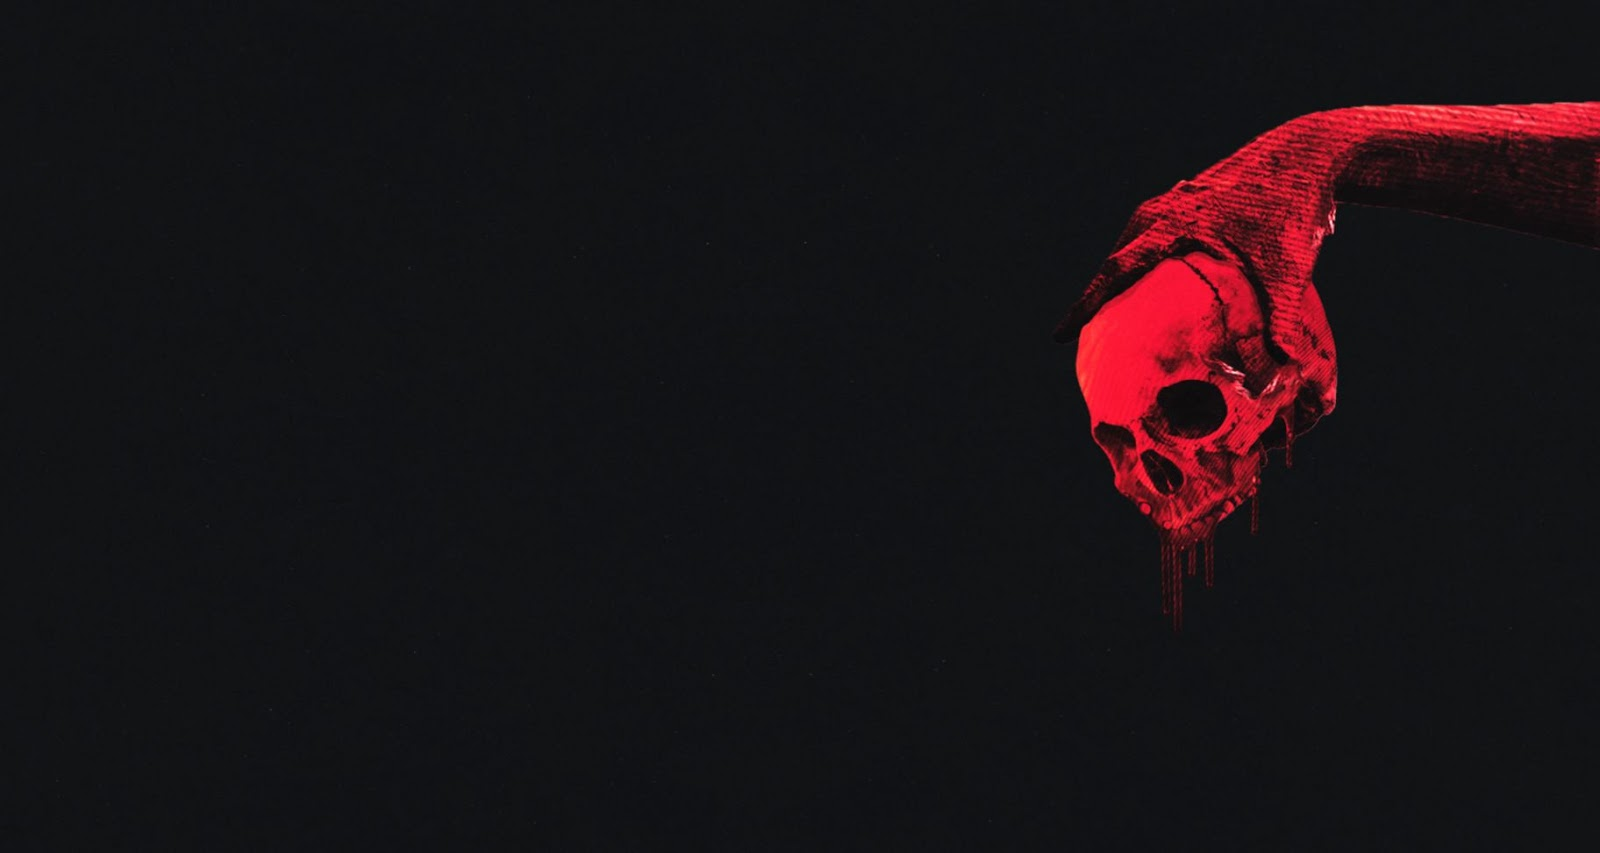 Red Skull Wallpapers Wallpapers App